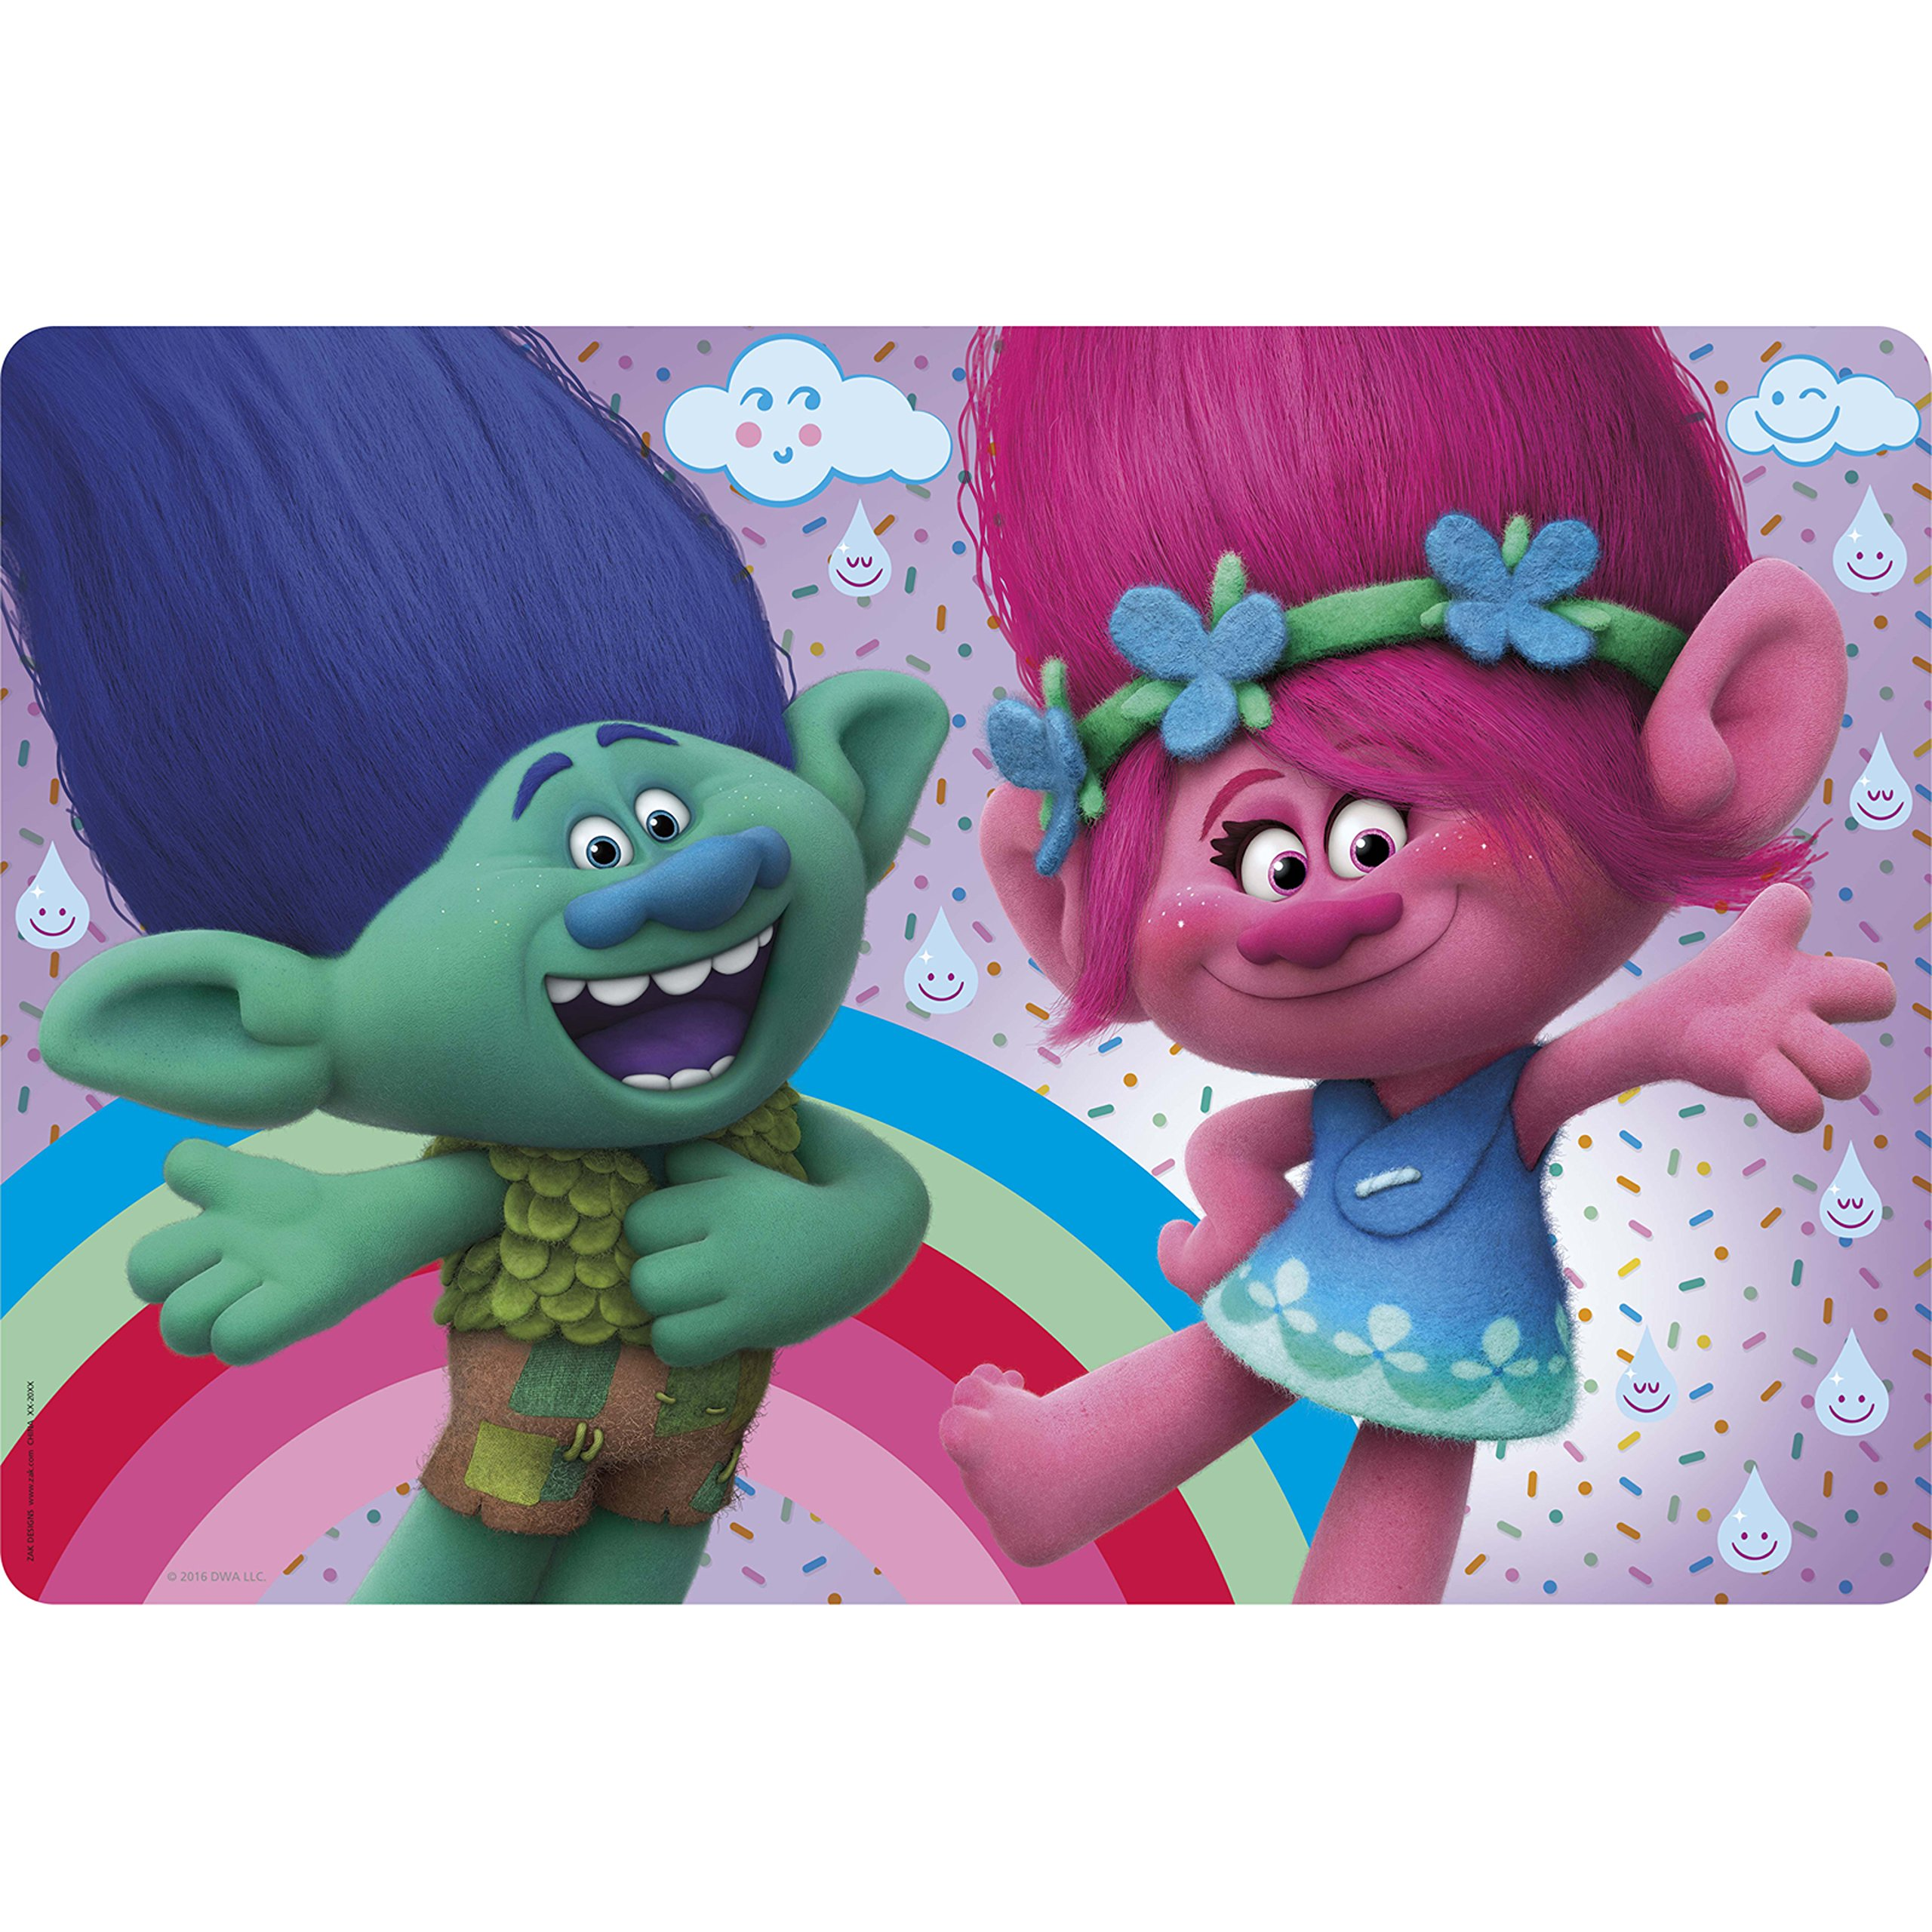 Zak Designs Trolls Movie TROG-1300 Poppy & Branch Kid's Placemat 17.6'' x 11.3'' by